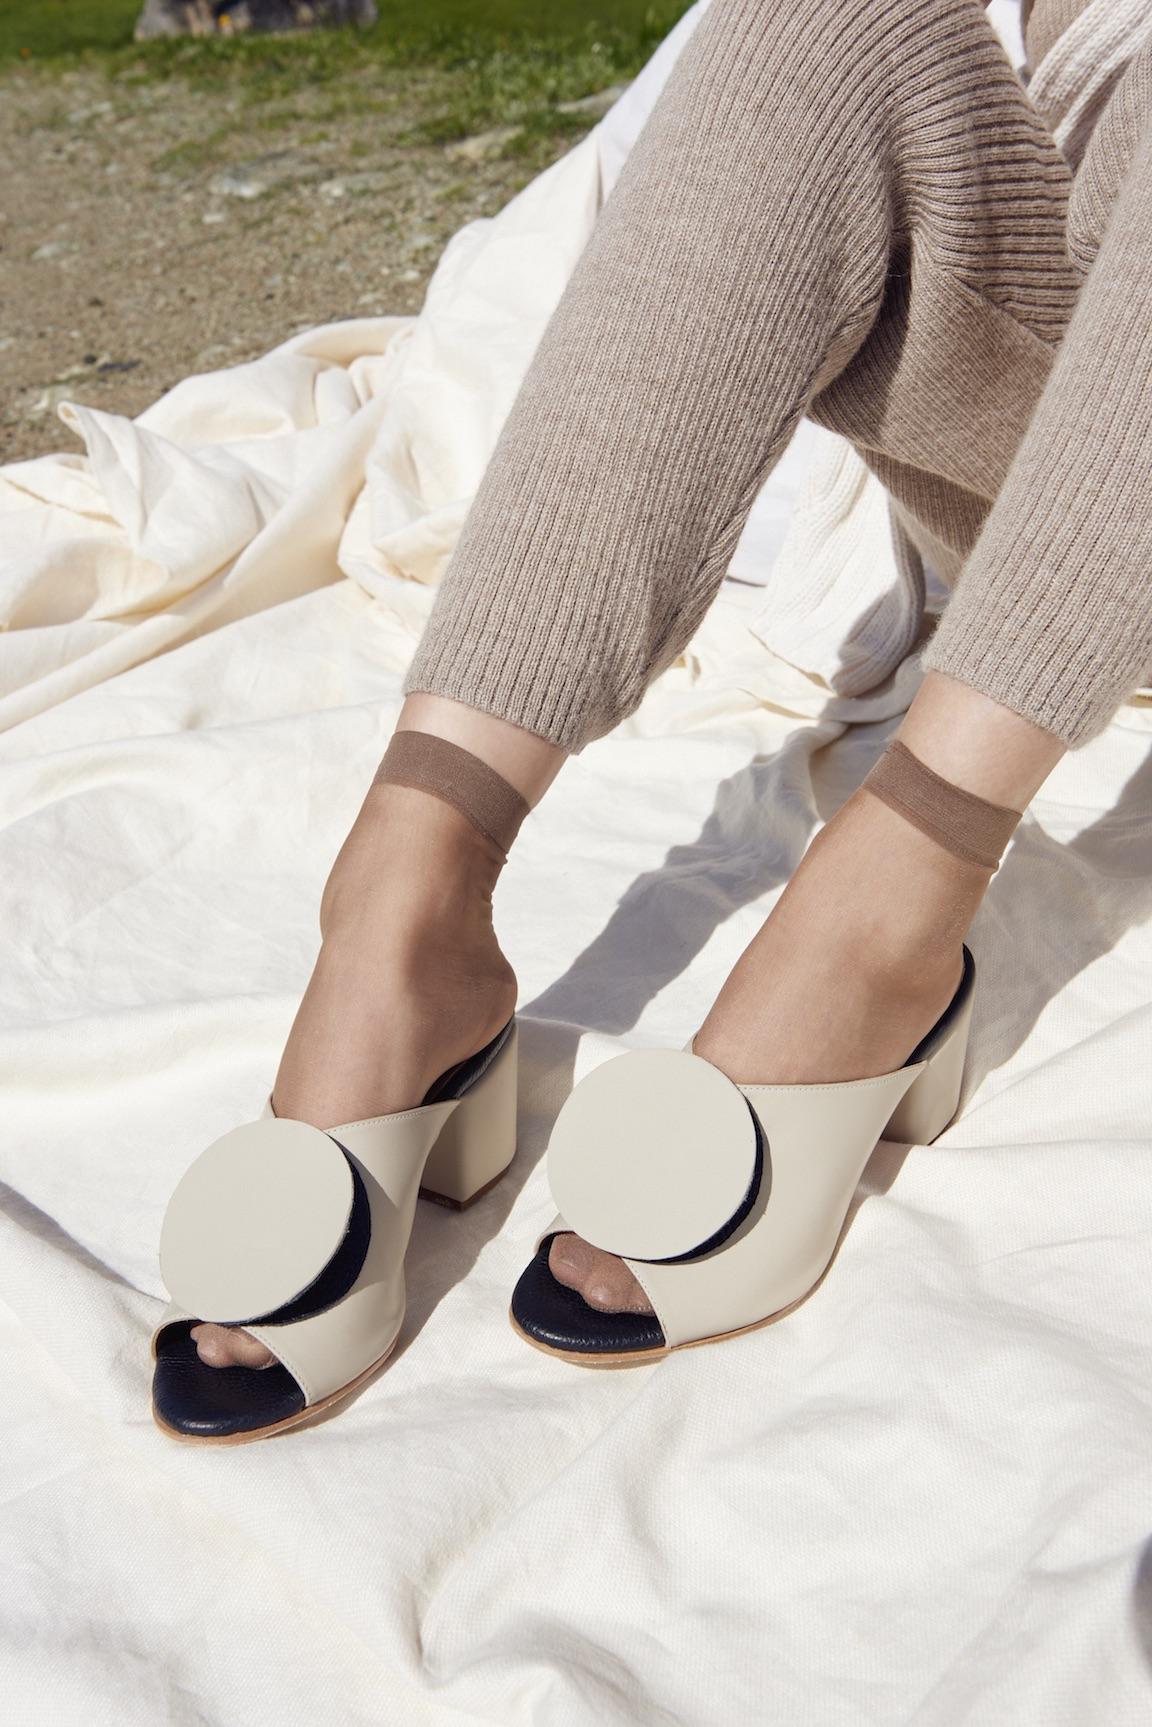 Lauren Manoogian jumpsuit, The Palatines shoes.